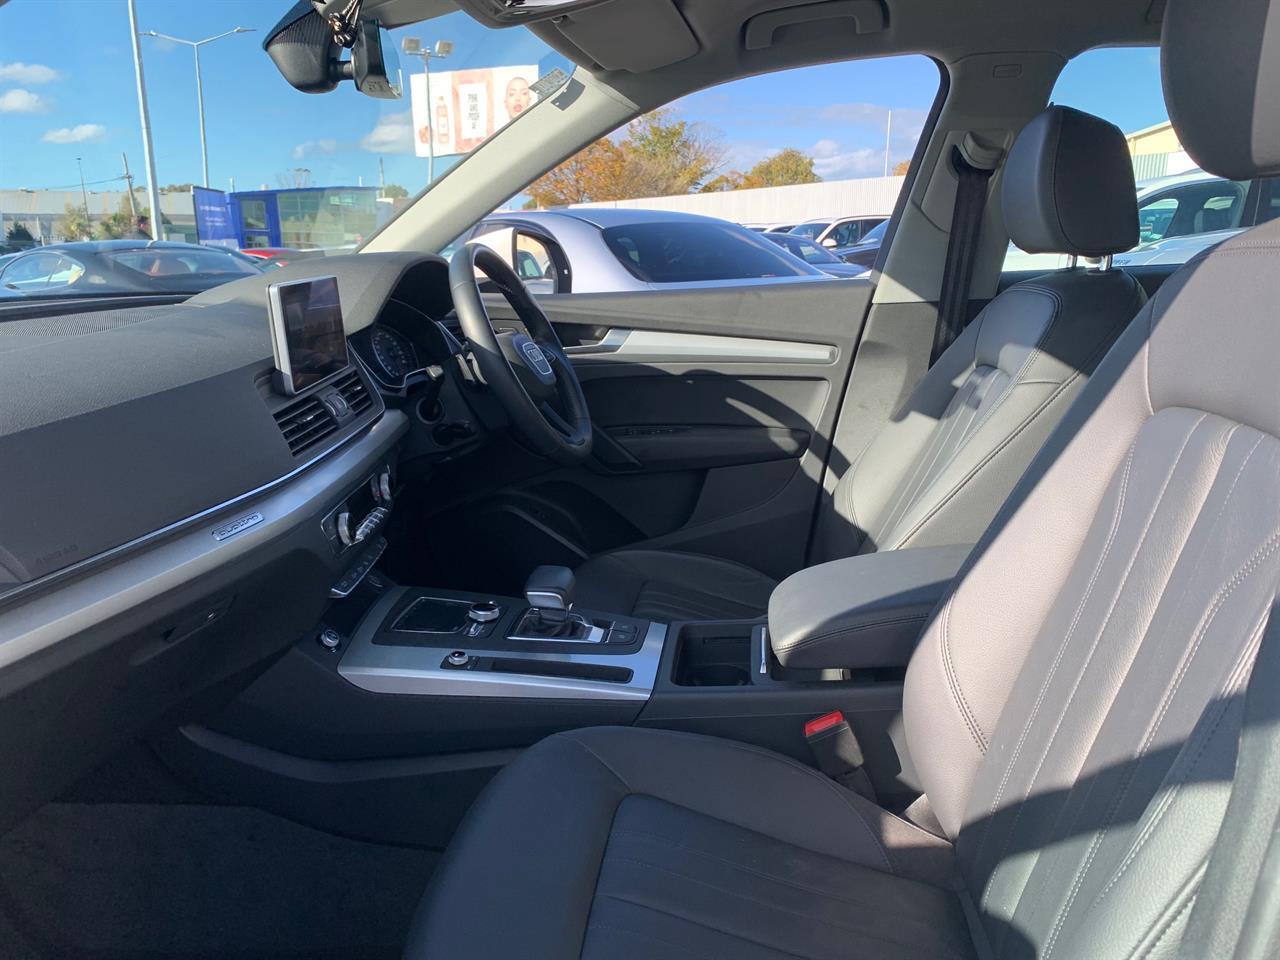 image-5, 2017 Audi Q5 2.0T FSI New Model Quattro at Christchurch